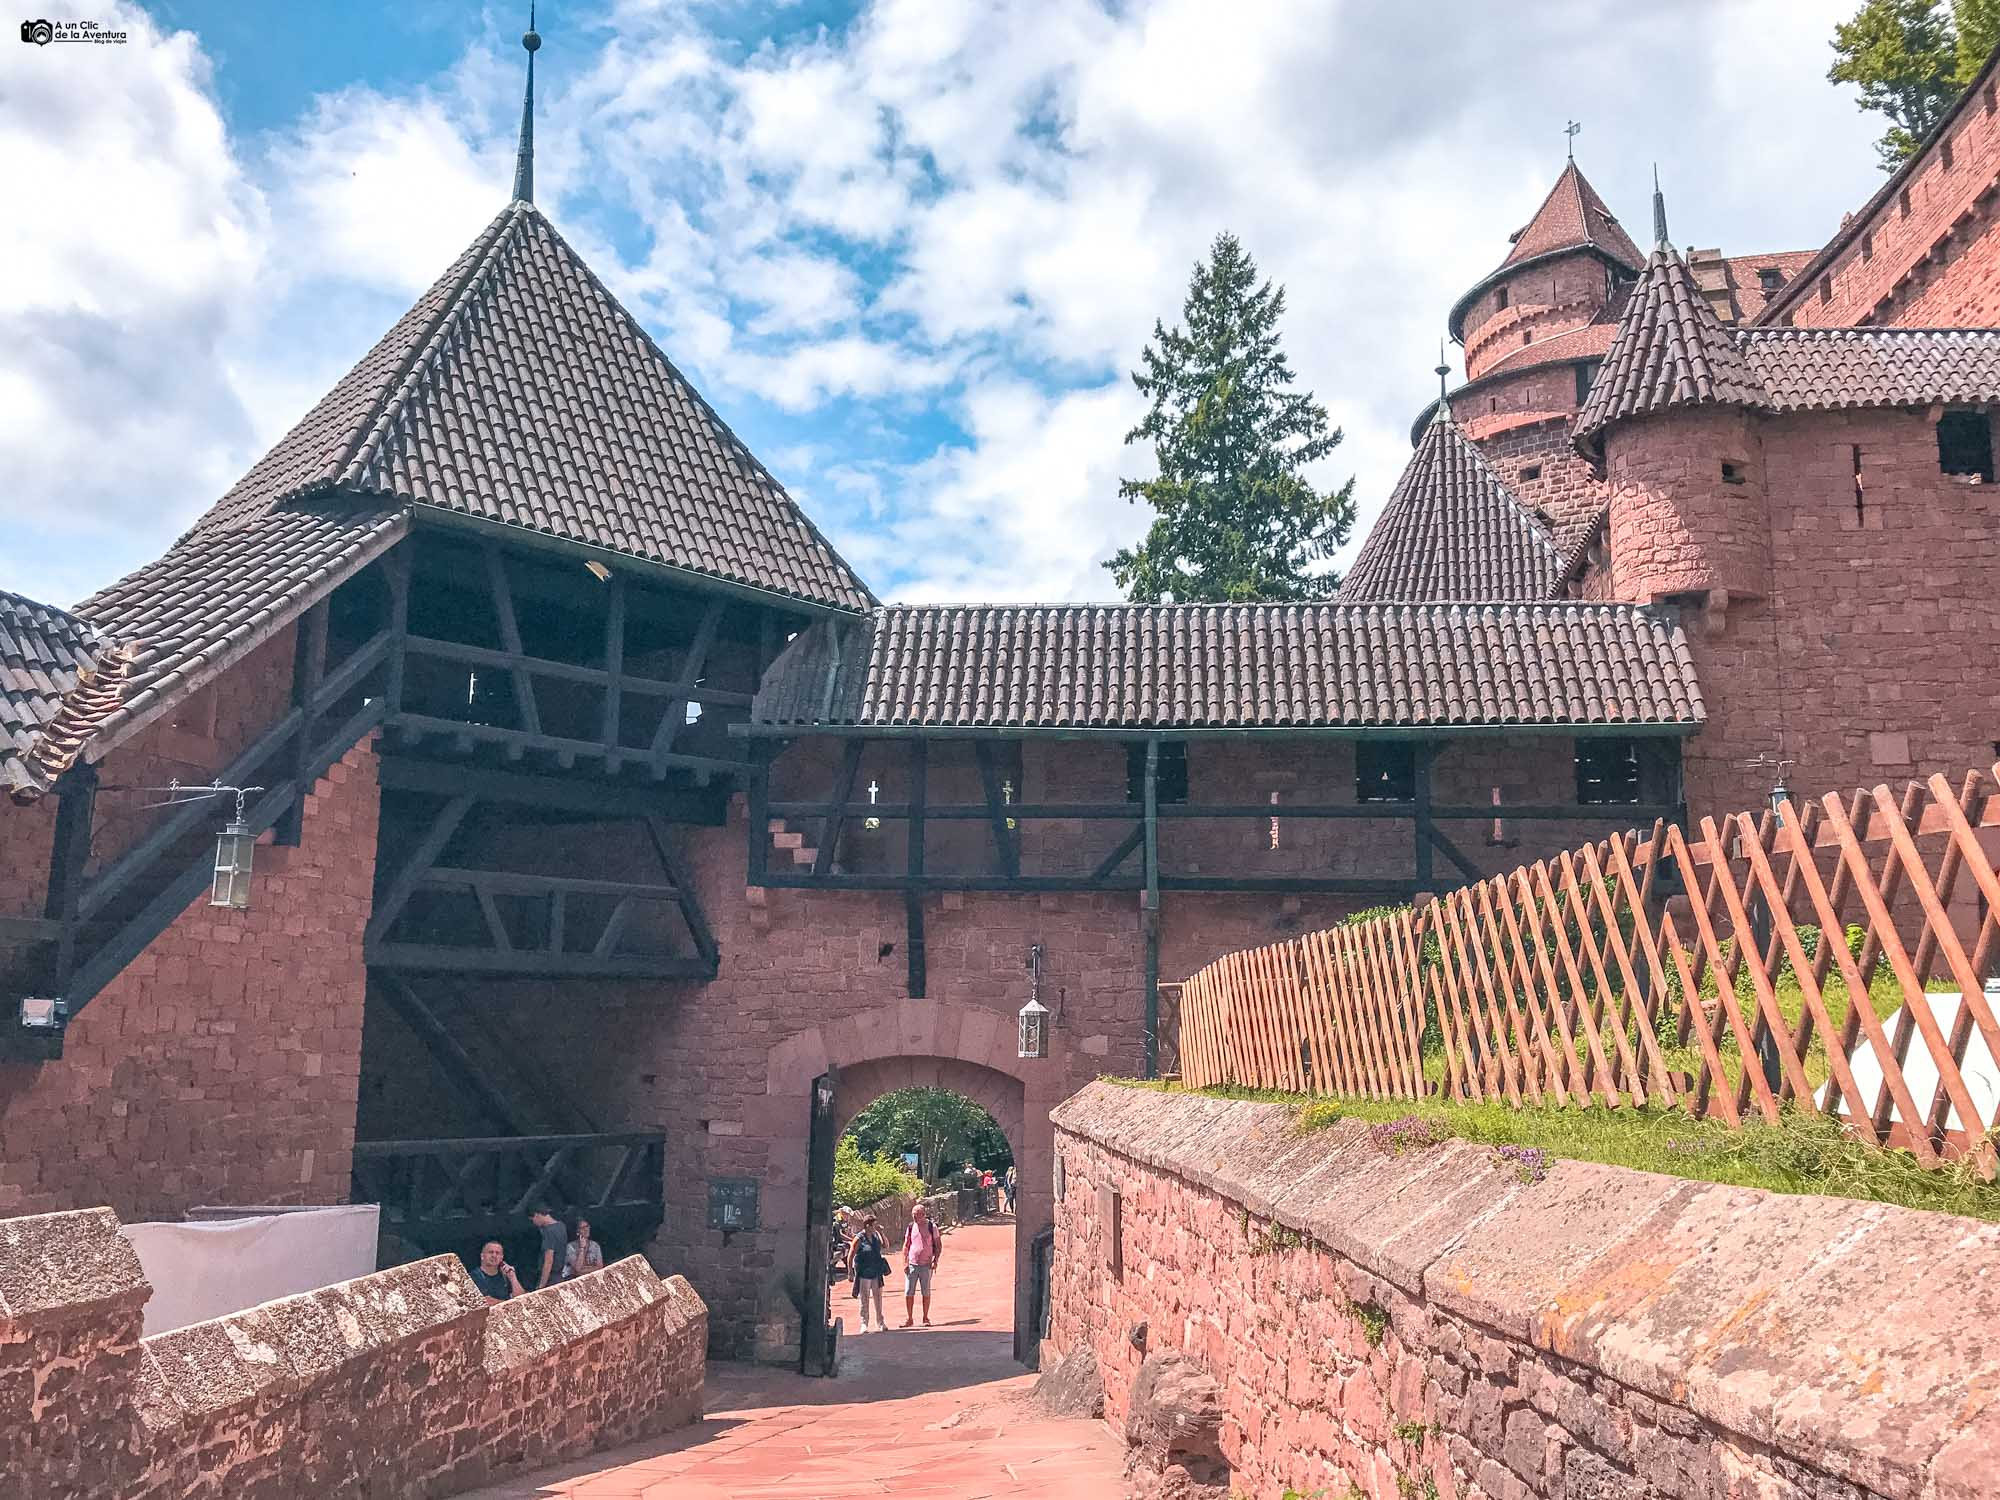 Salida del Castillo de Haut-Koenigsbourg